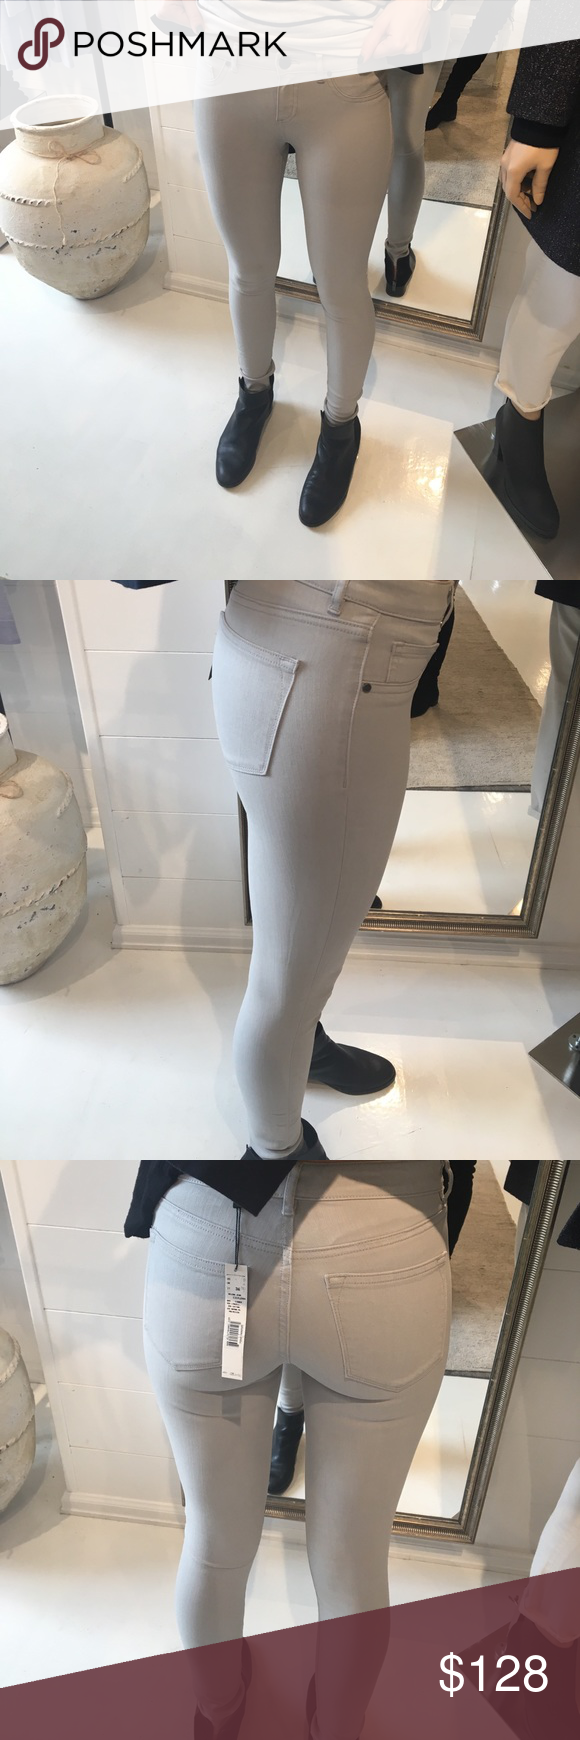 ELIE TAHARI Selena Jeans *Further marked down* Elie Tahari Selena Jean. Size 0/US 4/UK 36/ITA Full waxed jeans- Color Cider (Light Grey) NEVER WORN, Tags on!! Elie Tahari Jeans Skinny